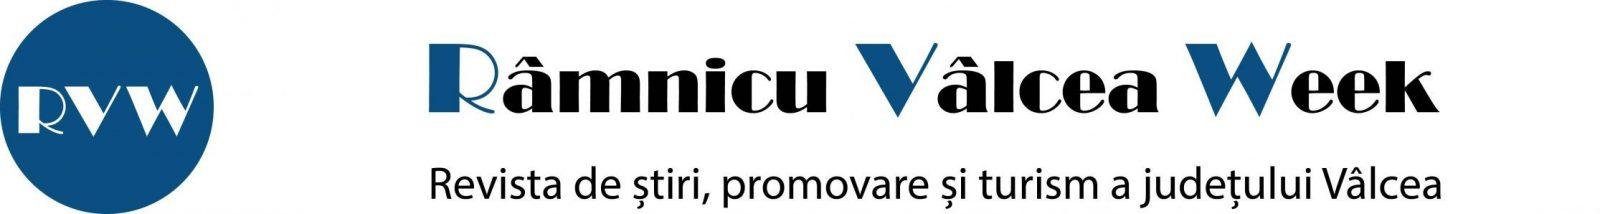 Ramnicu Valcea Week